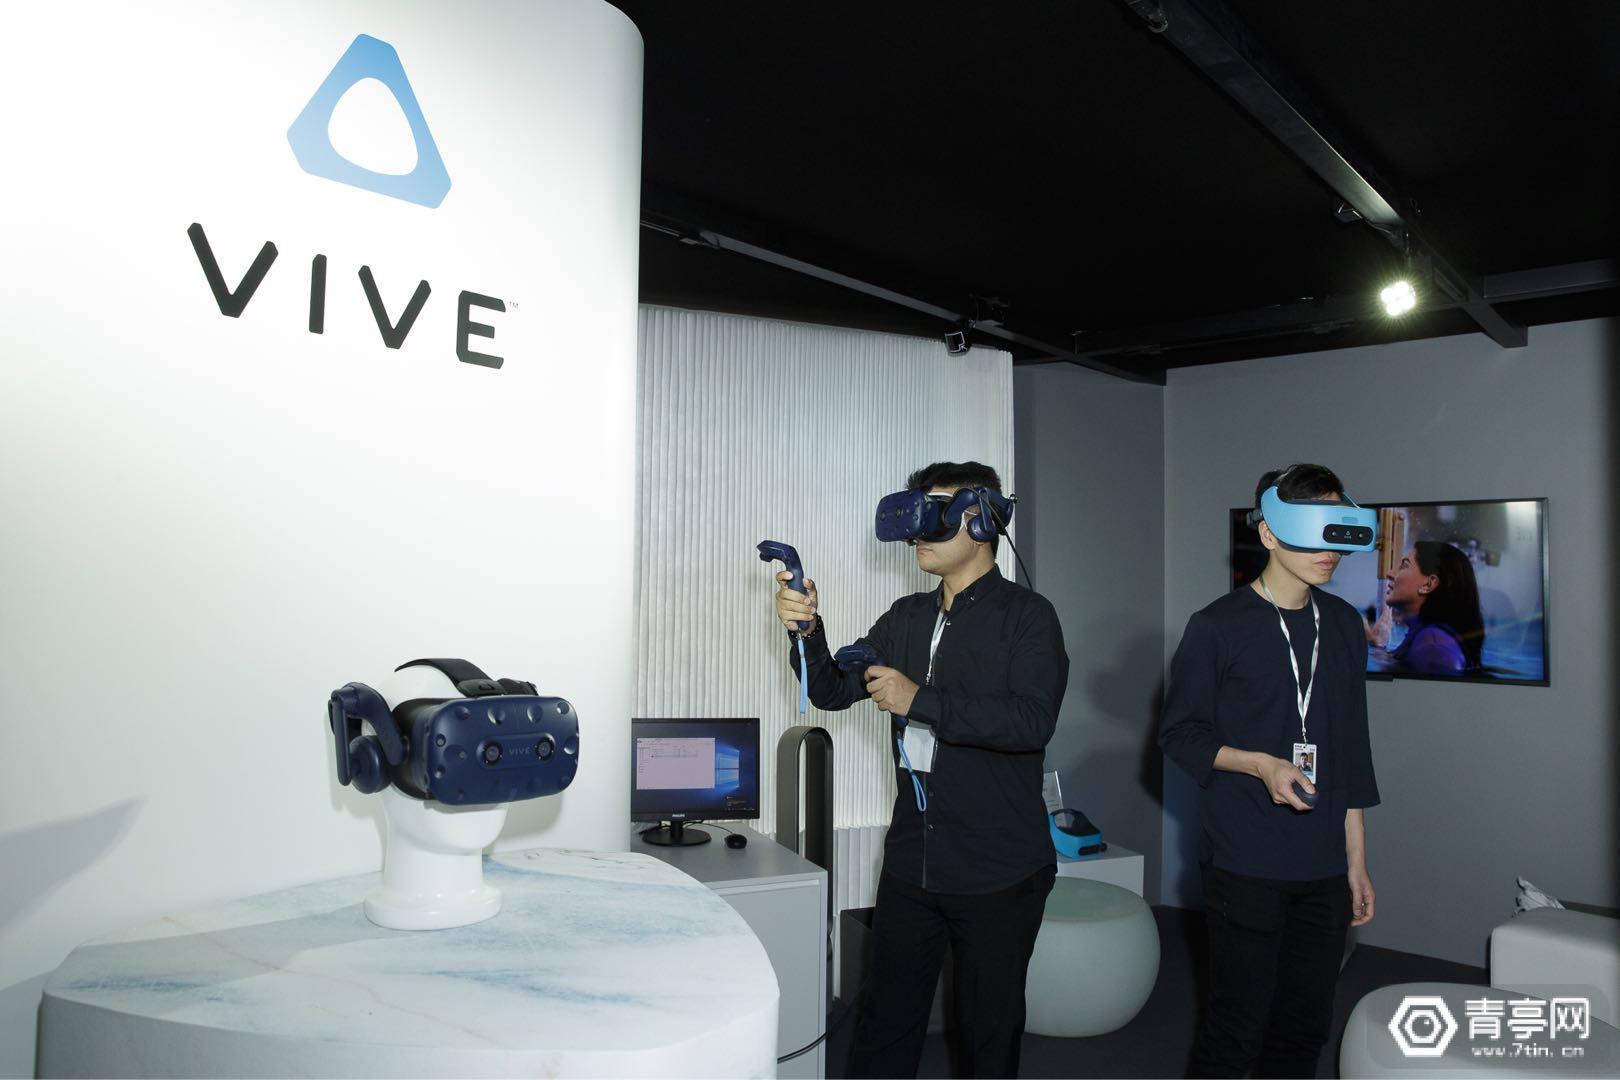 HTC VIVE携手巴塞尔艺术展展示国际知名艺术家VR作品